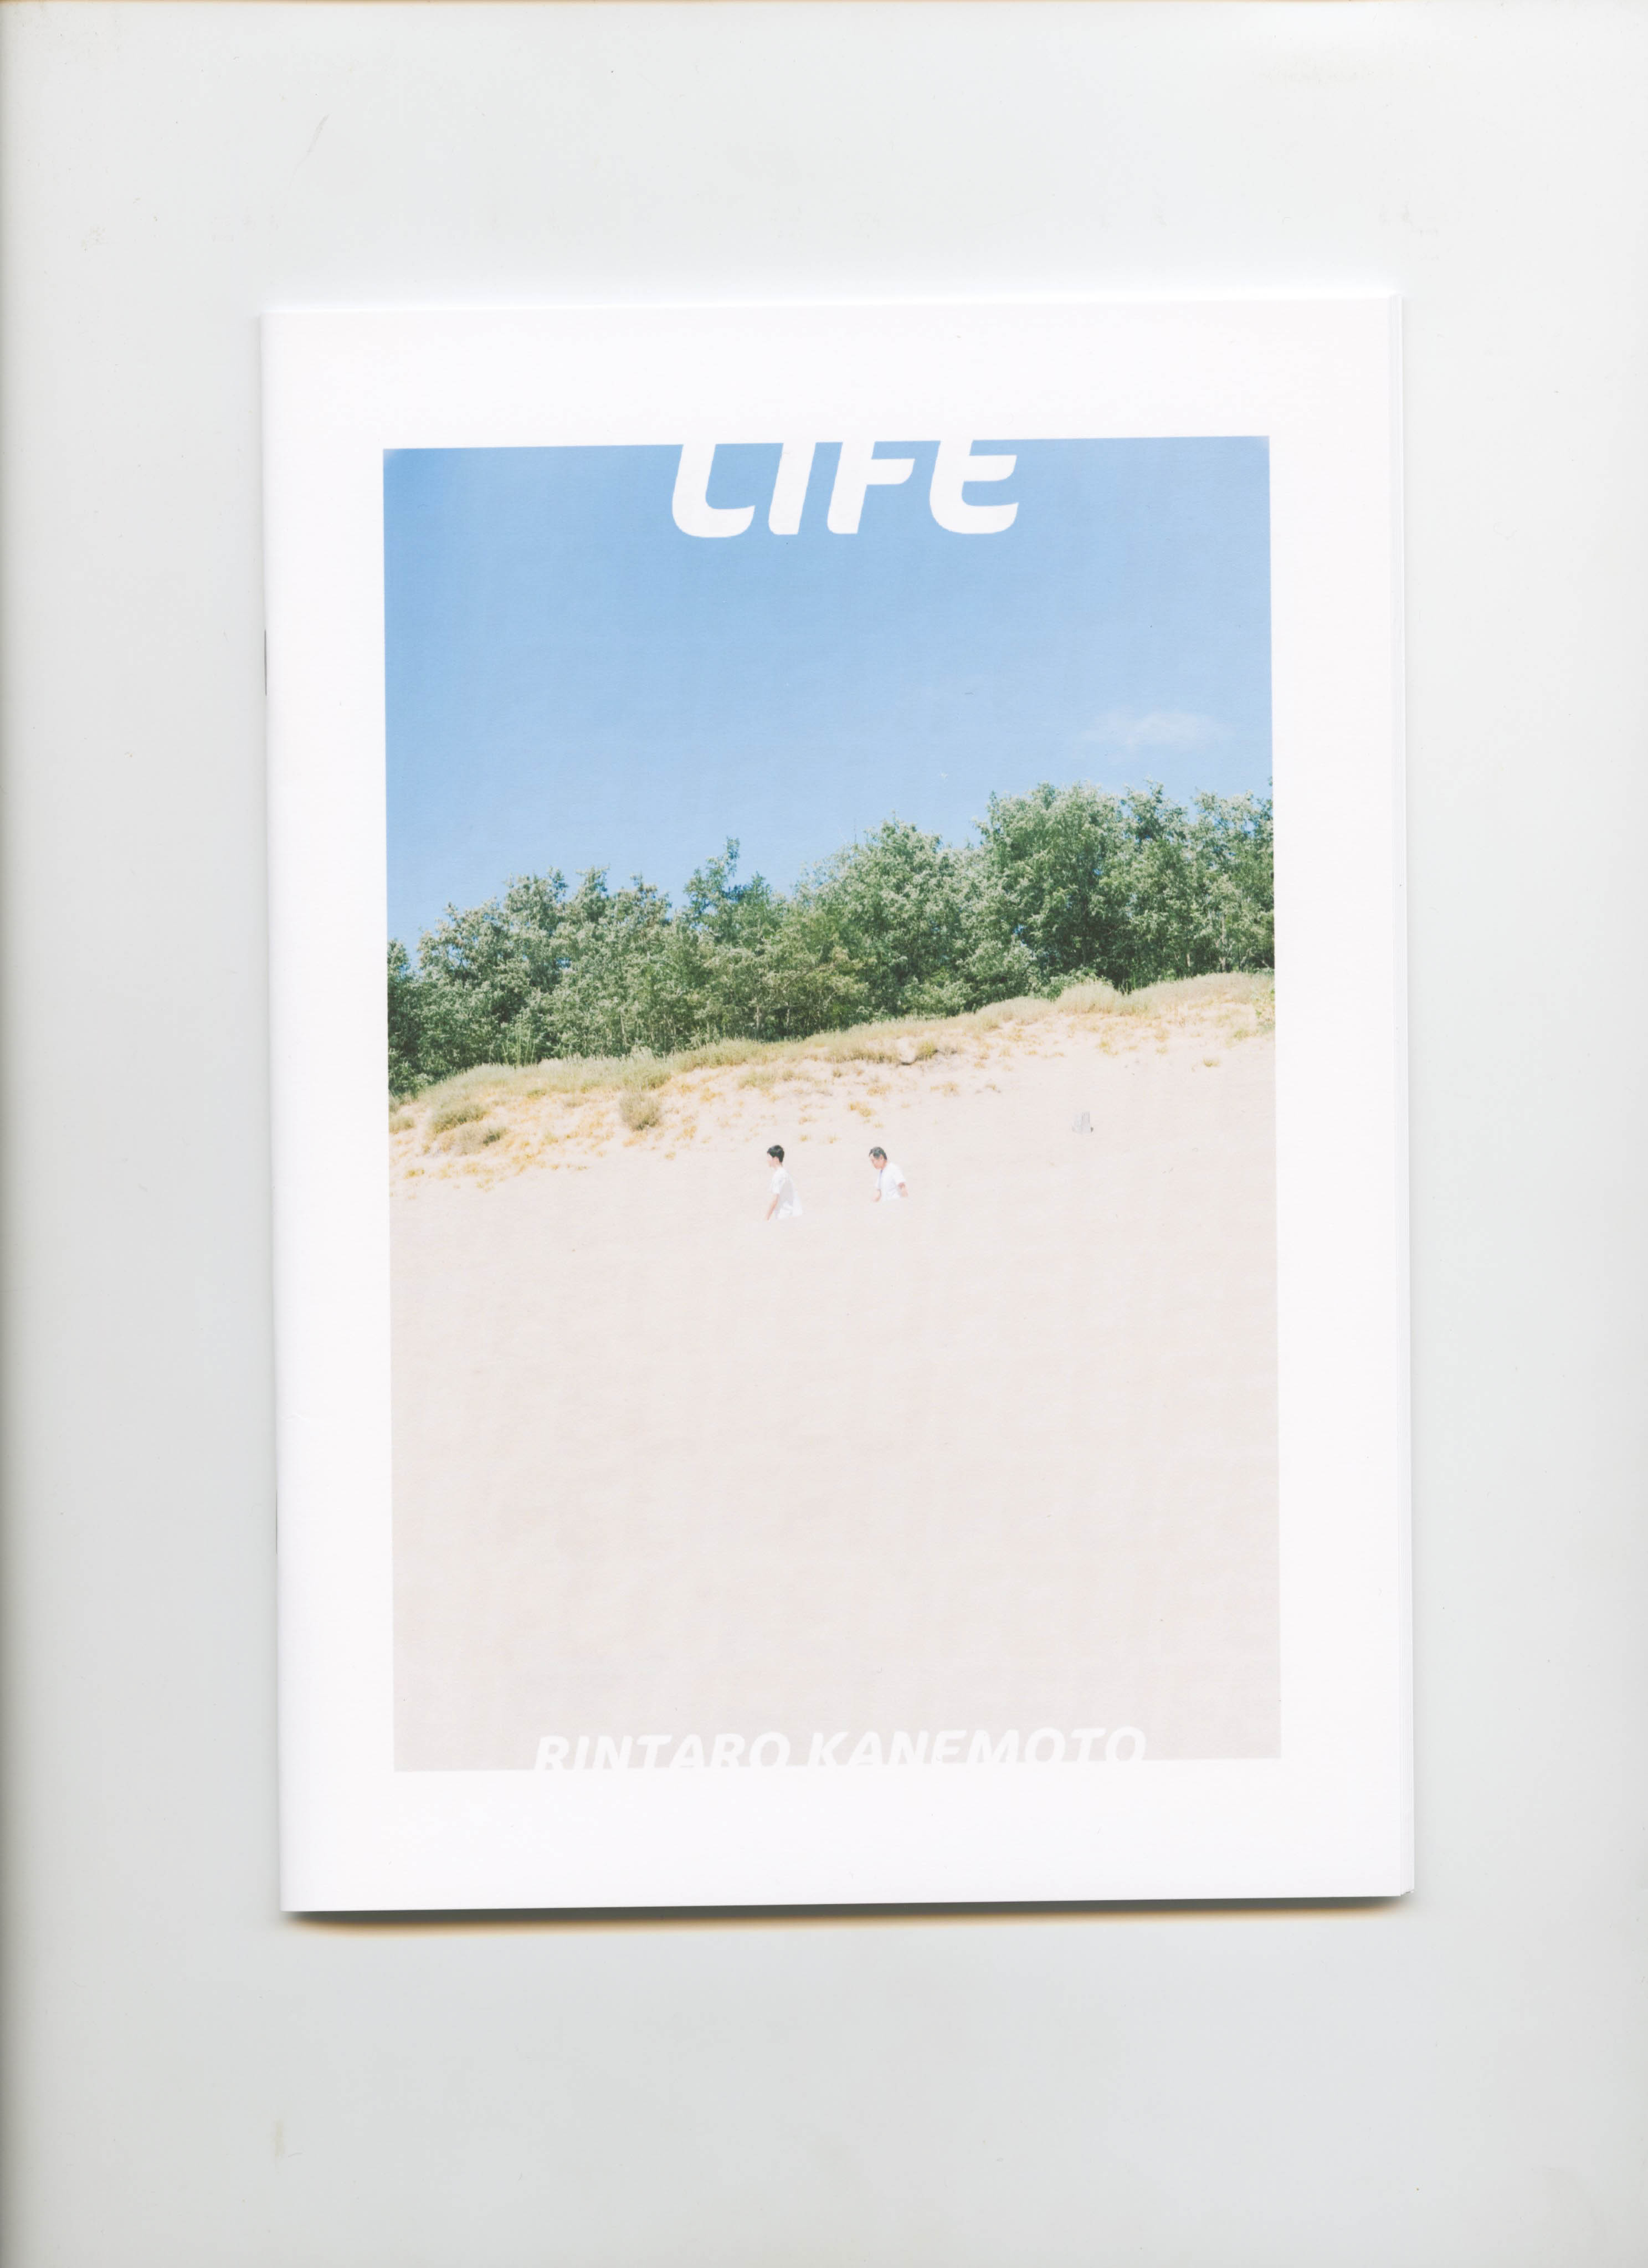 Life001